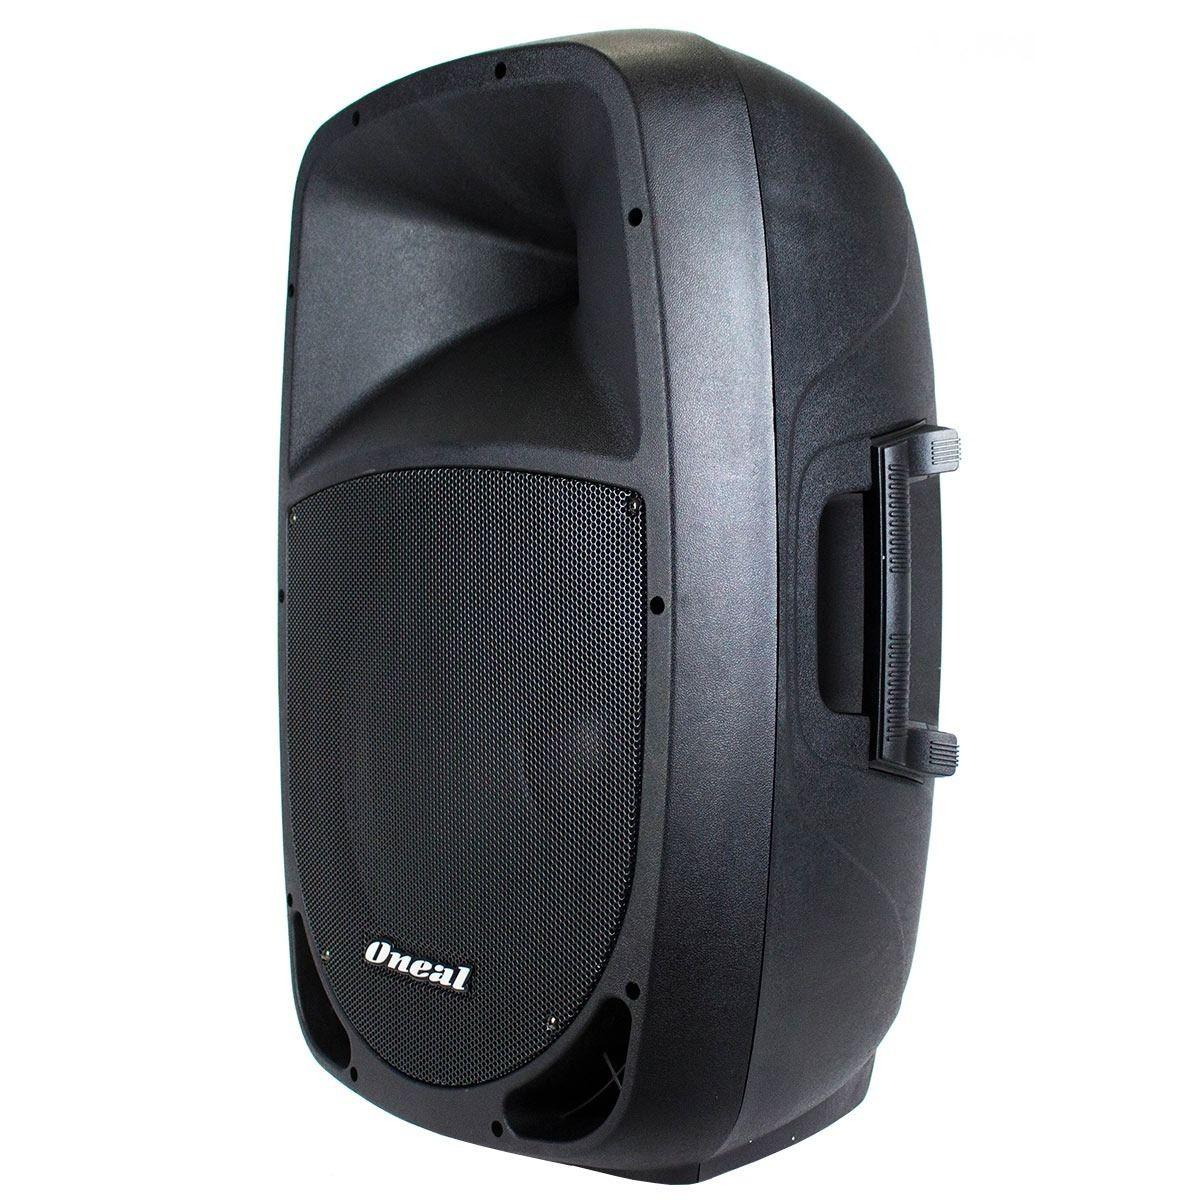 Kit Caixa de Som Oneal Ativa Passiva Opb1112 Ob1112 + Microfone Vws20 + Suporte